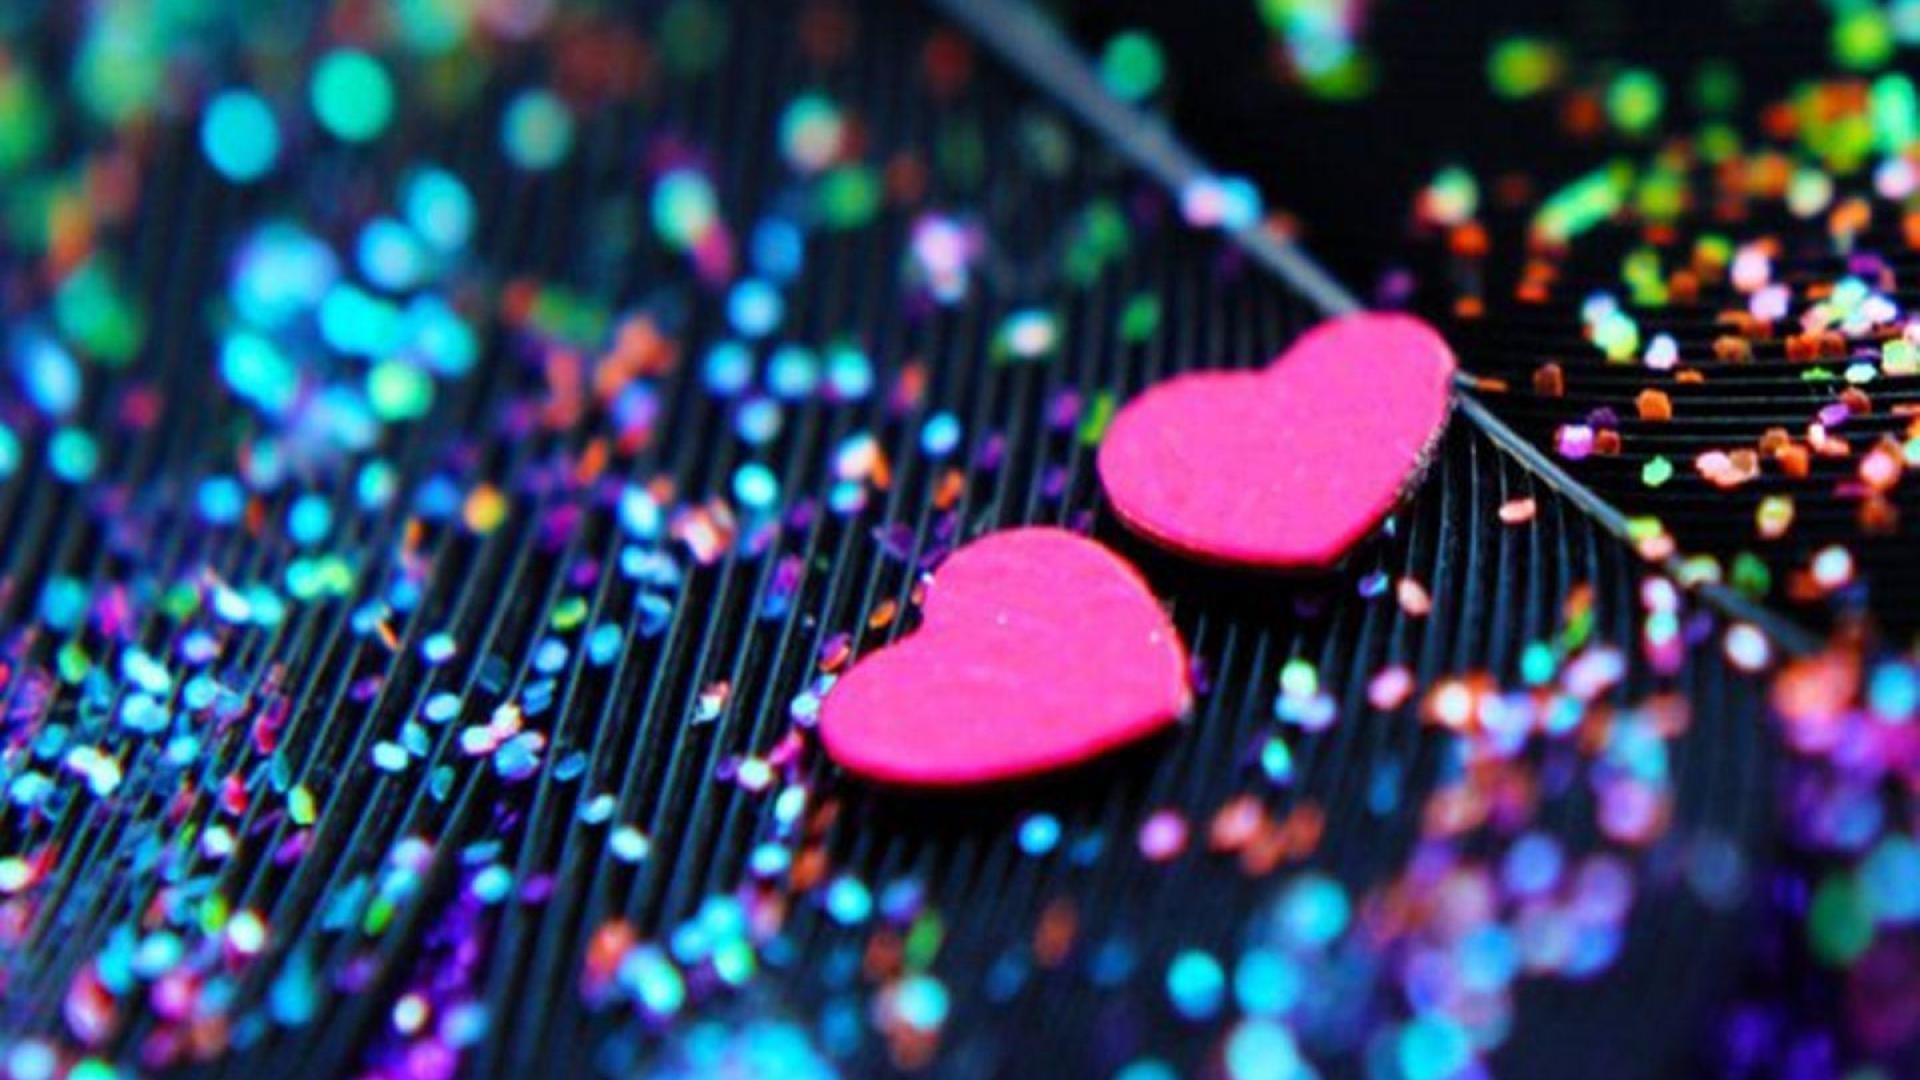 Tags: love, glitter, heart